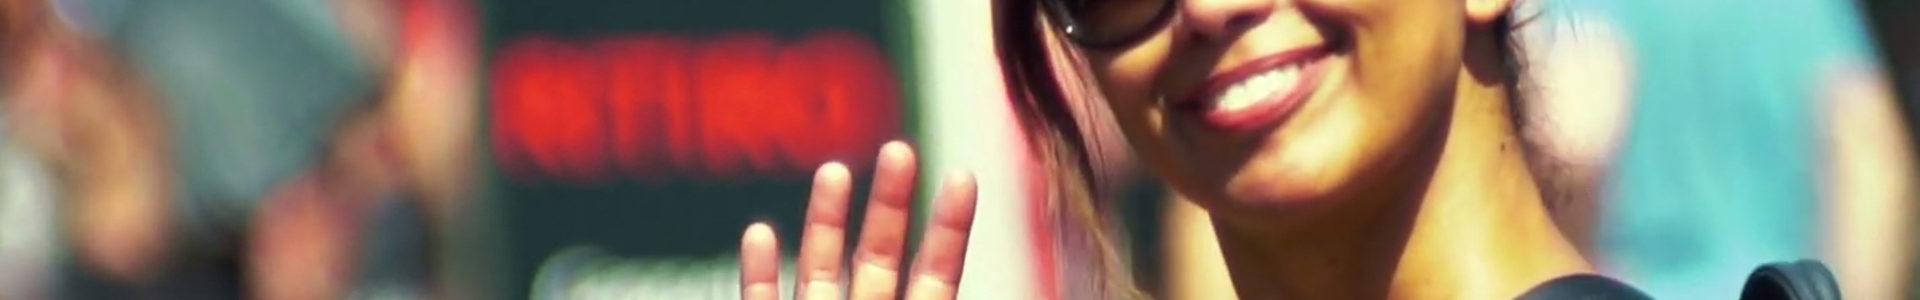 Deejay TRI 2019 Il video ufficiale